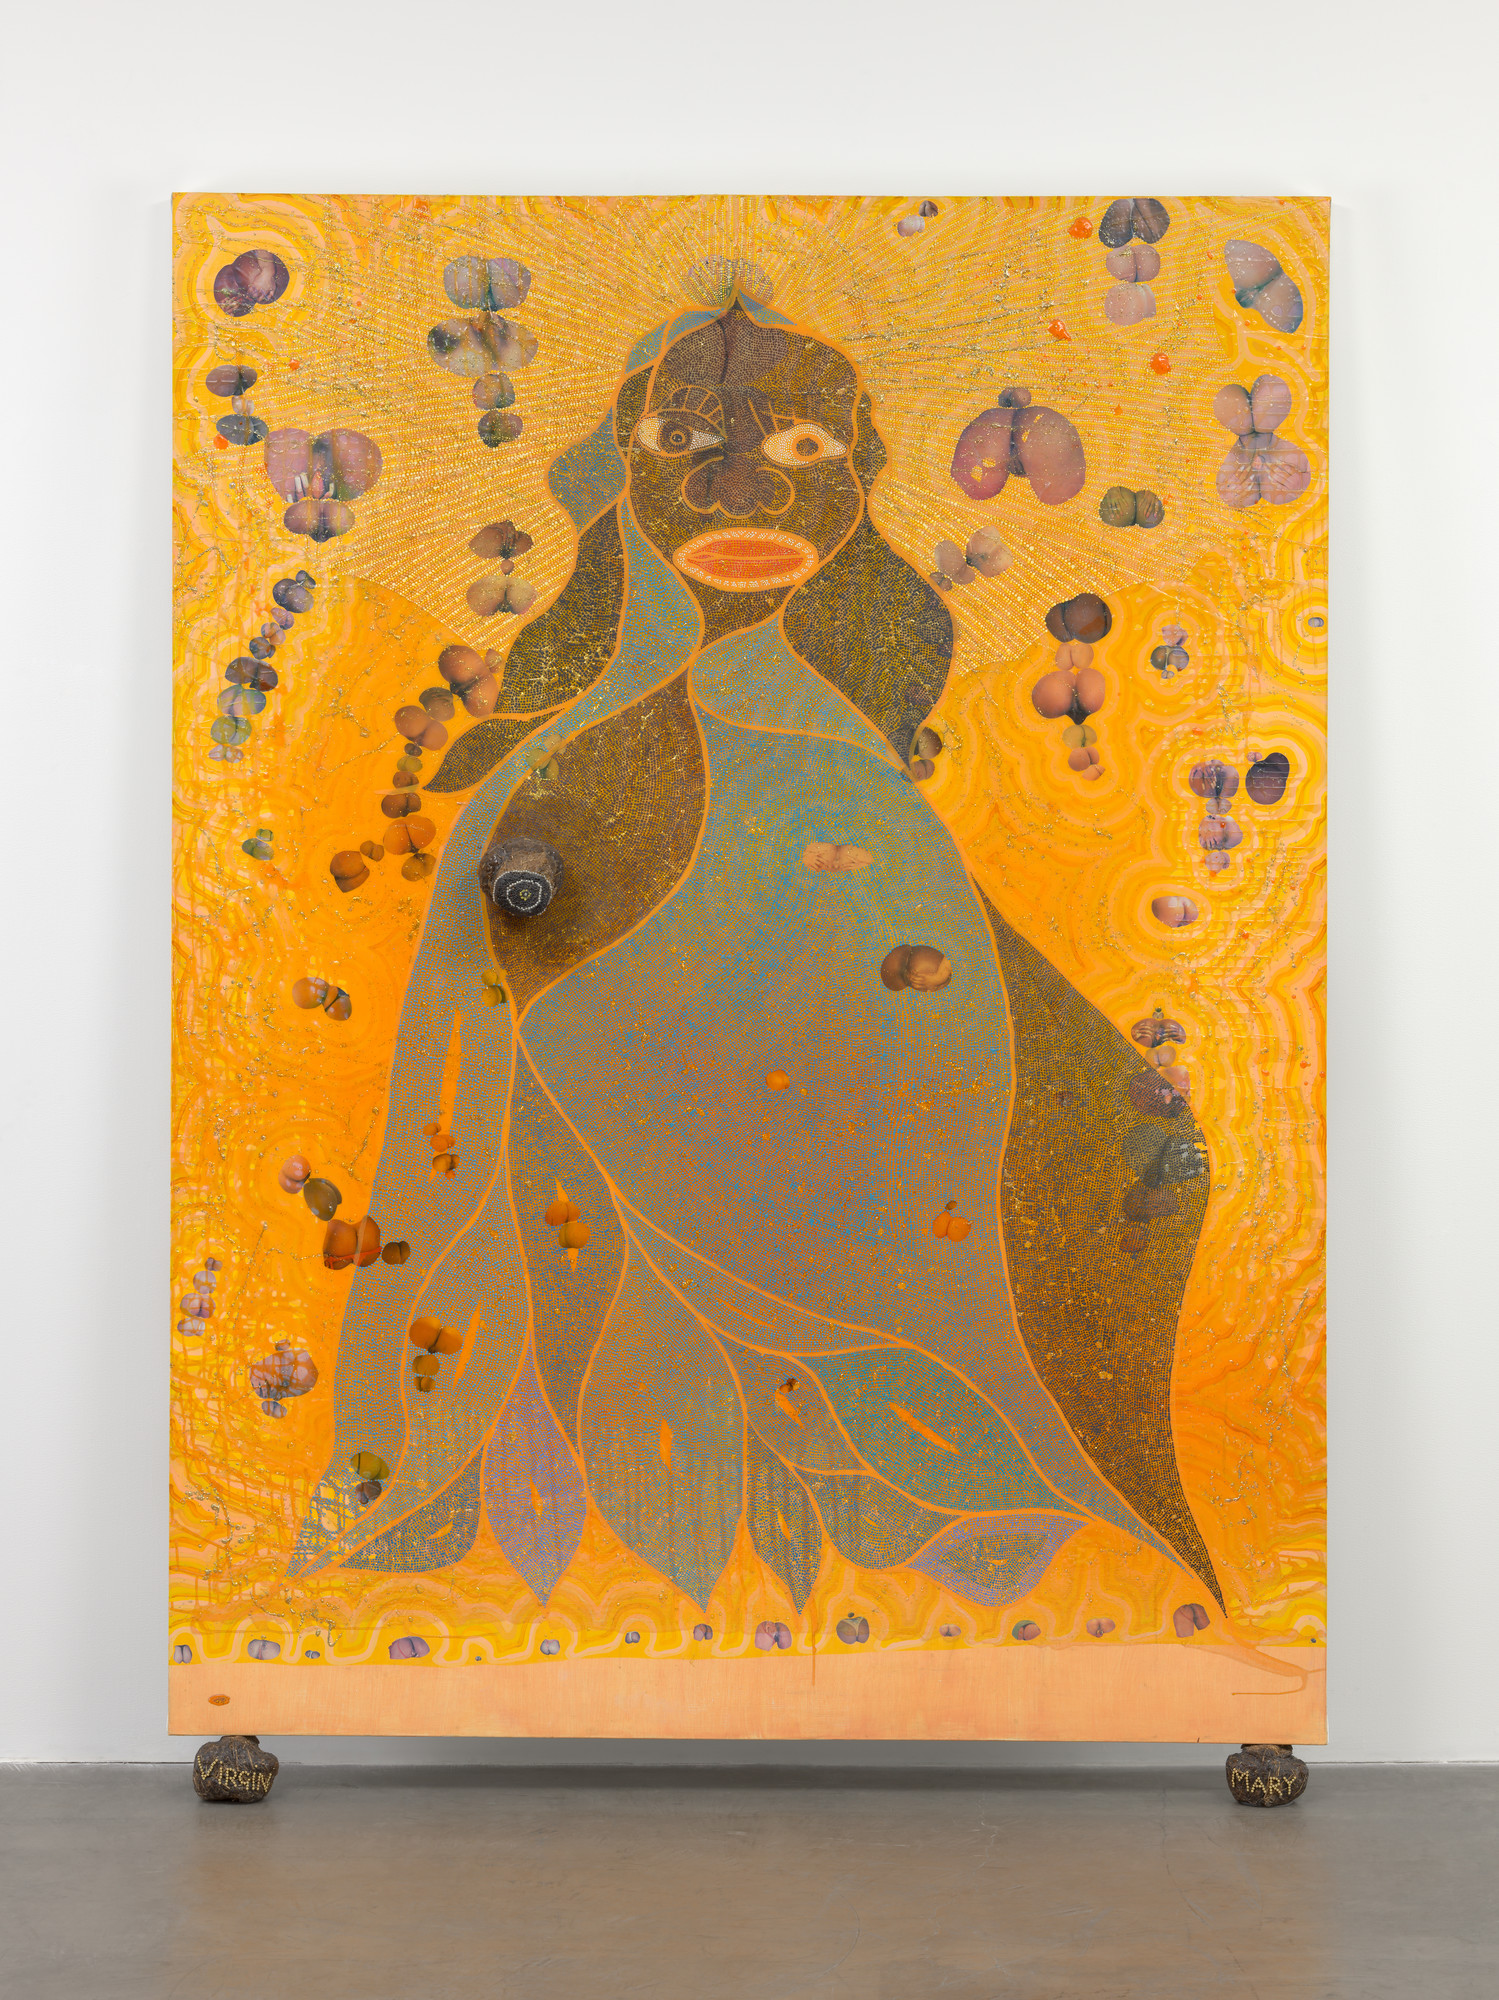 Chris Ofili: Szűz Mária – forrás: Museum of Modern Art